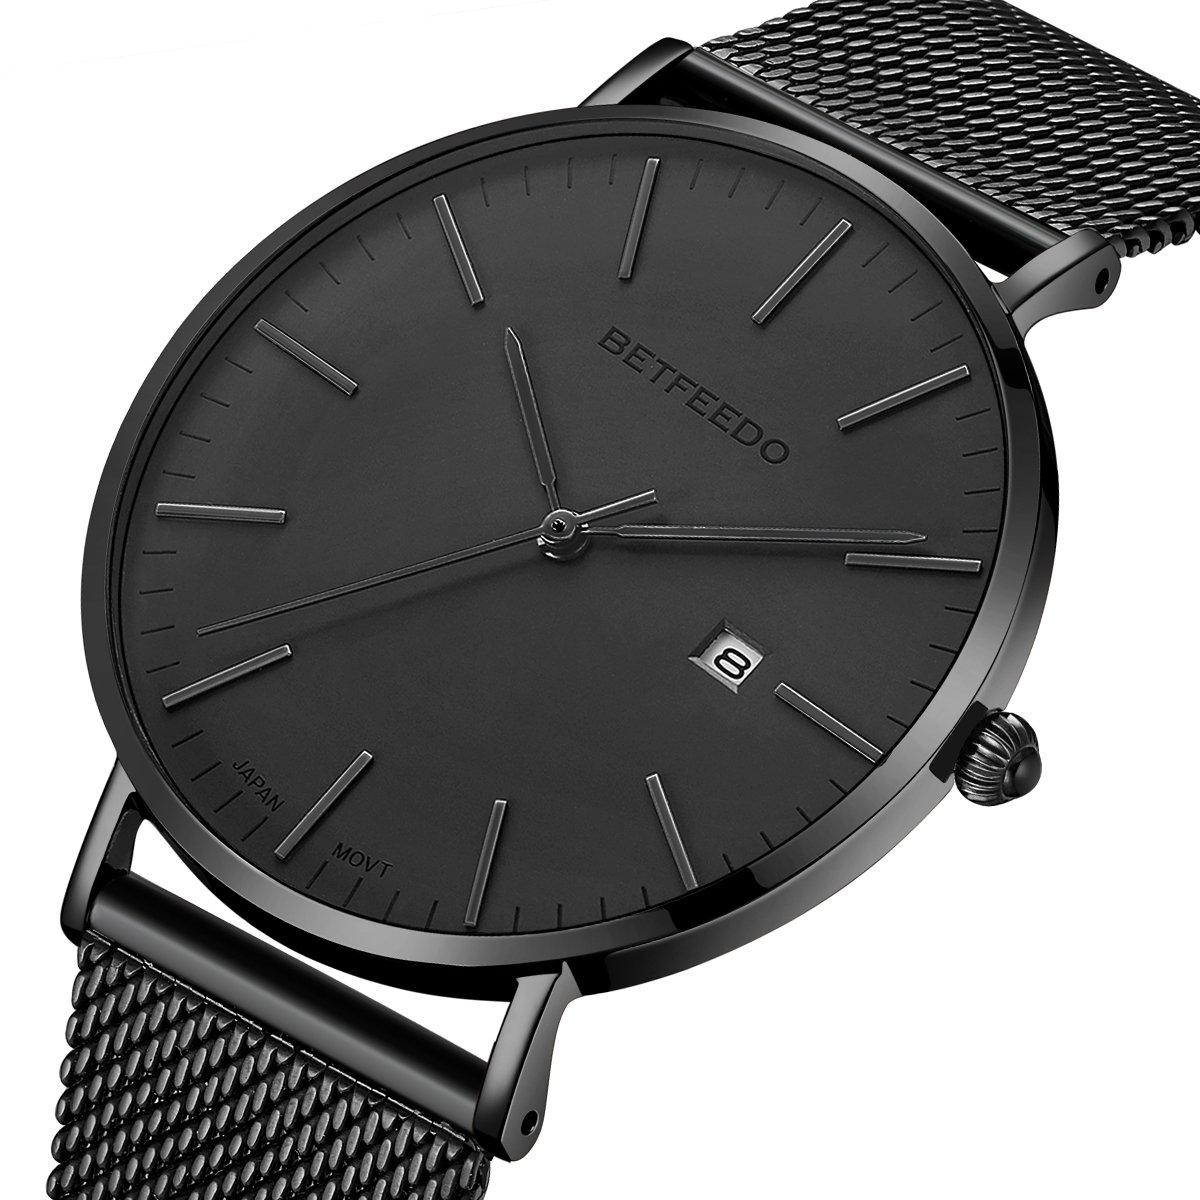 BETFEEDO Men's Wrist Watch, Black Fashion Date Slim Analog Quartz Watches with Stainless Steel Mesh Band (Black/Gray)